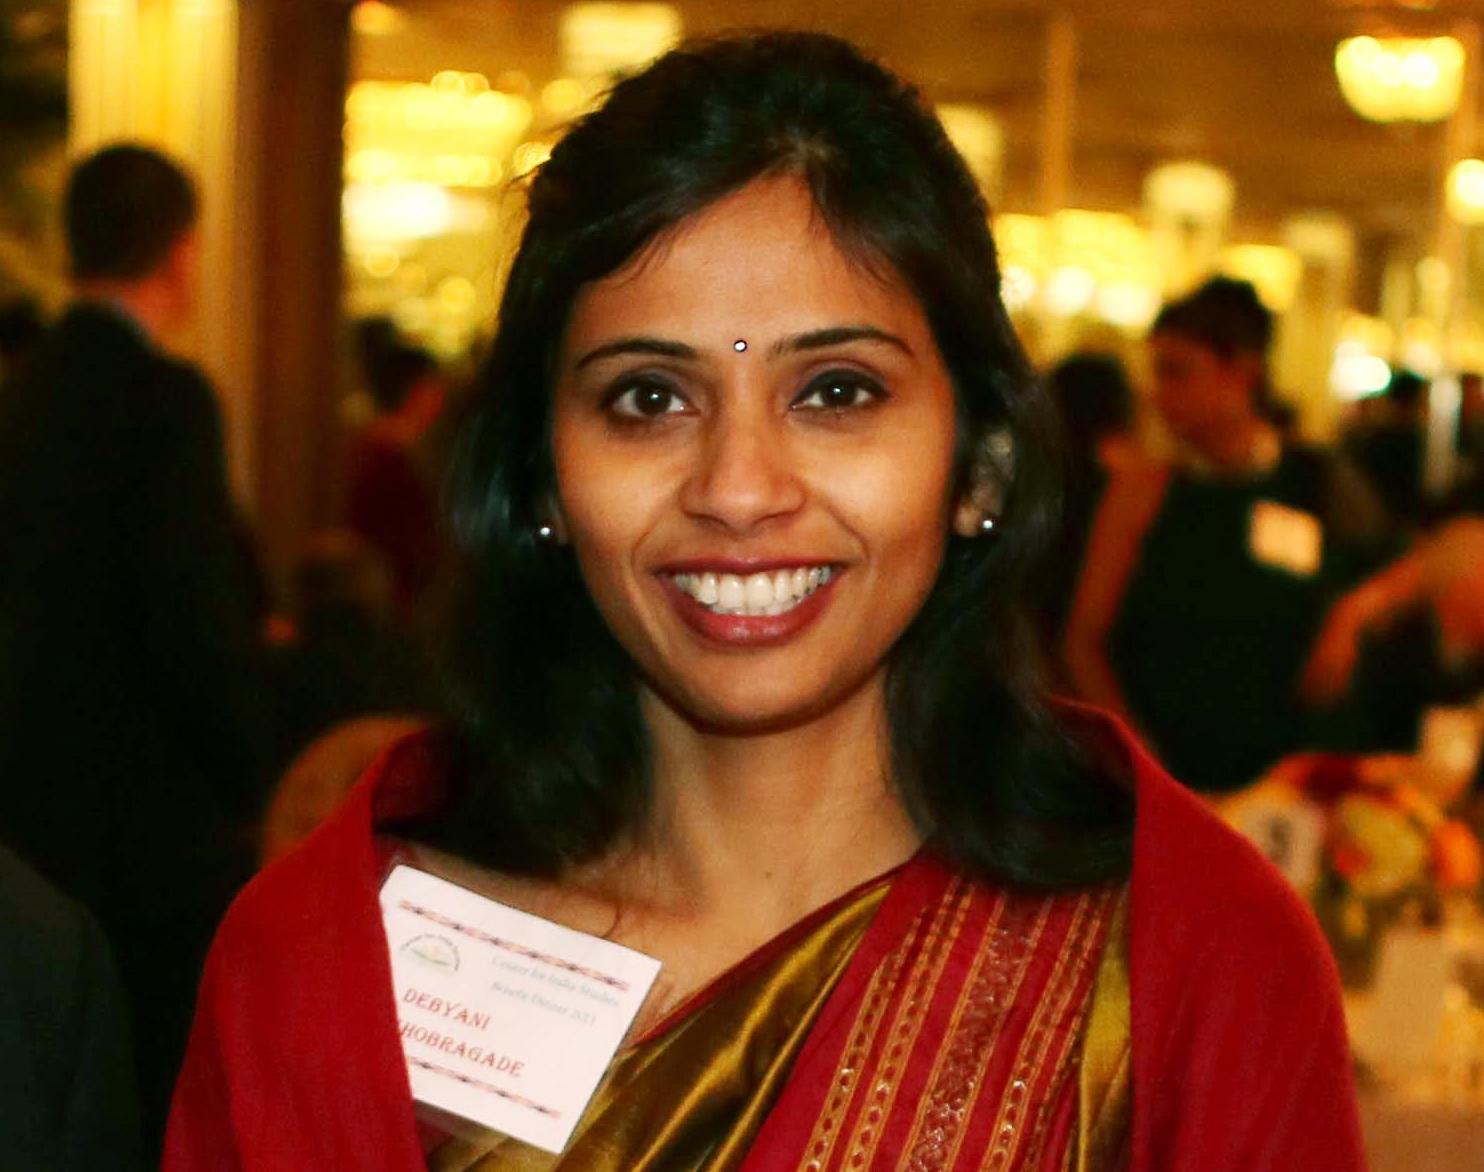 Devyani Khobragade, India's deputy consul general, attends the India Studies Stony Brook University fundraiser event in Long Island, New York